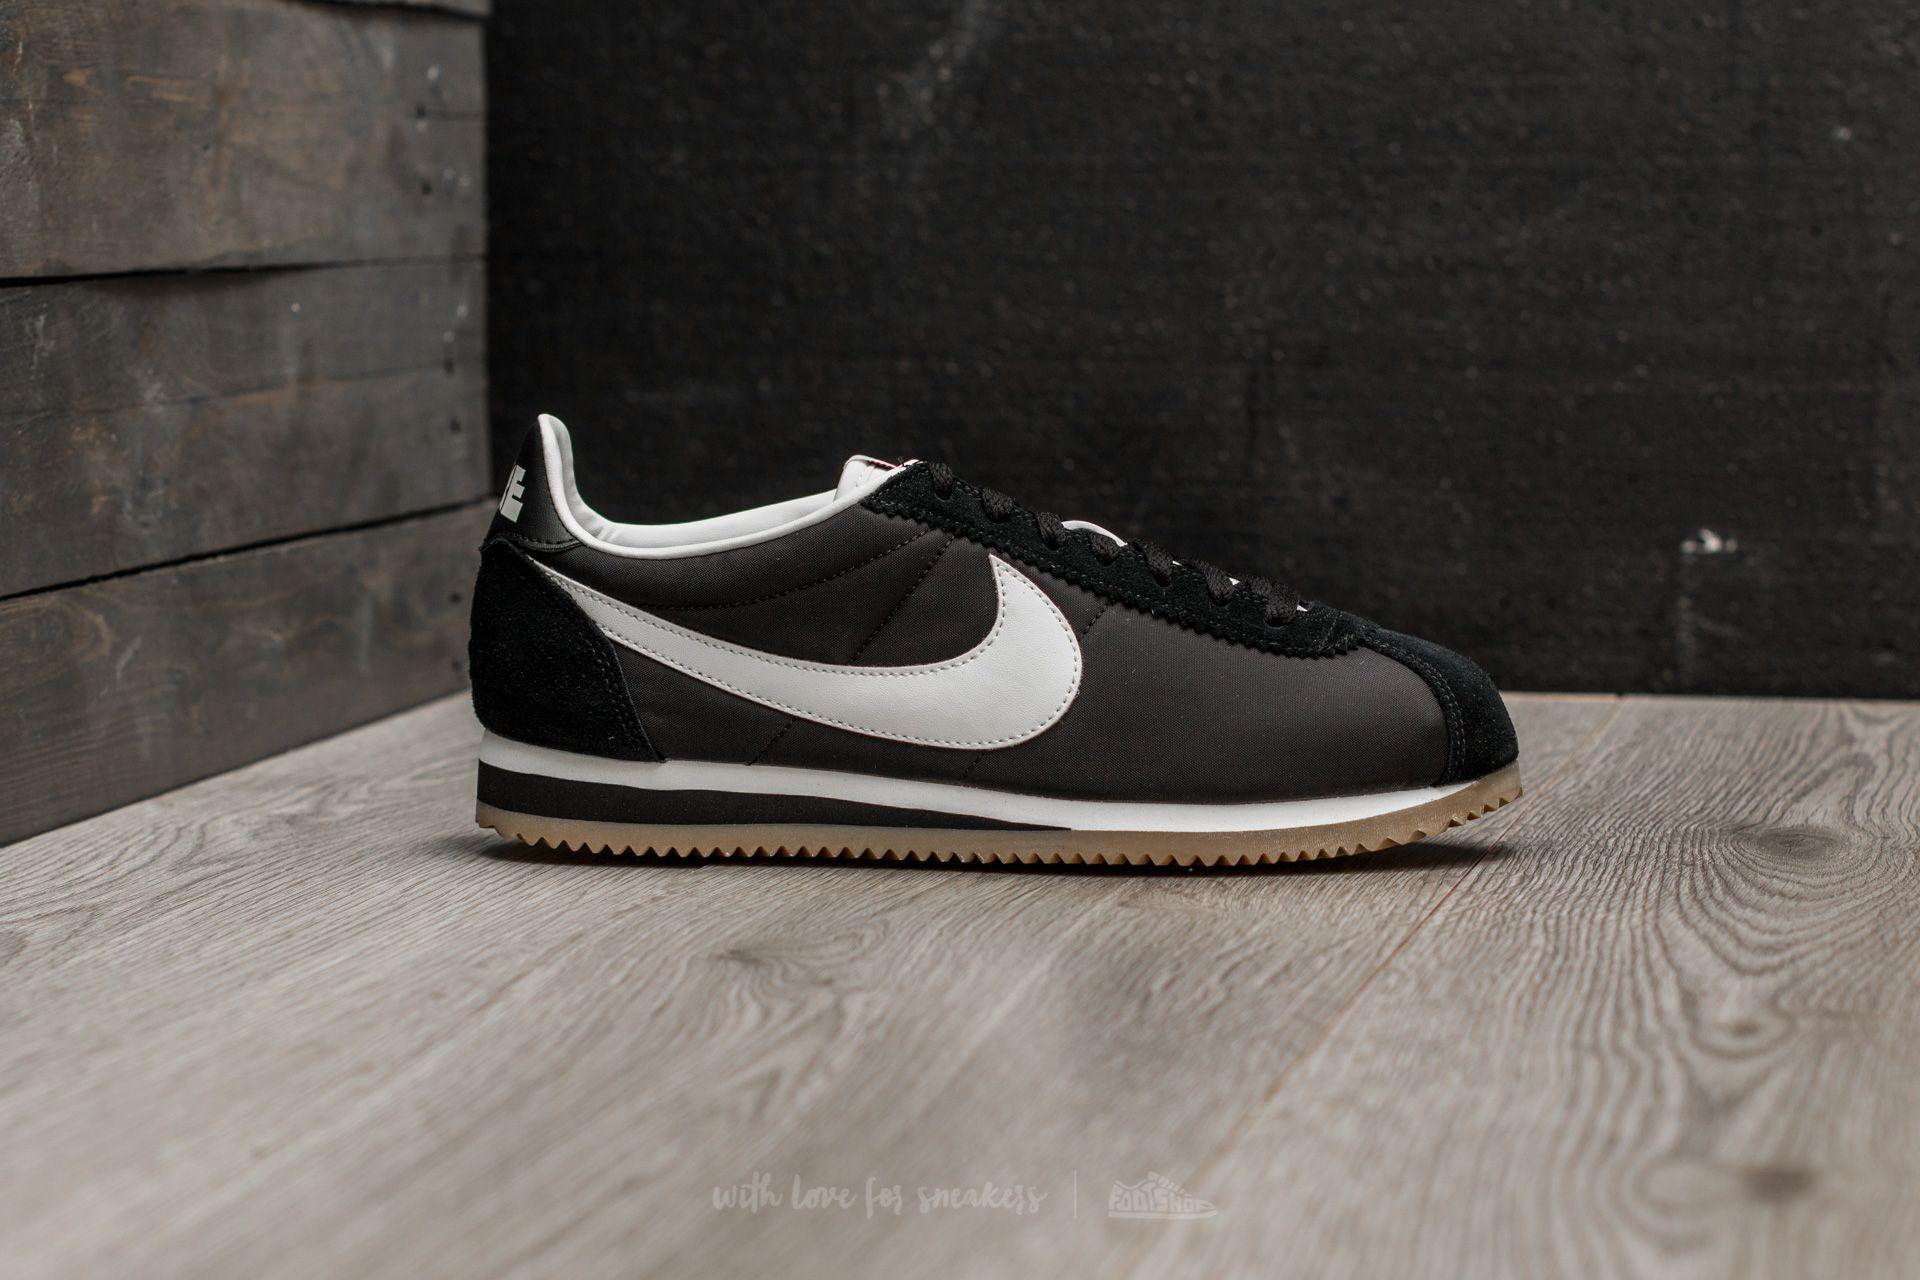 sports shoes f0707 12c02 Nike Classic Cortez Nylon Premium Black  Sail-gum Light Brown in ...